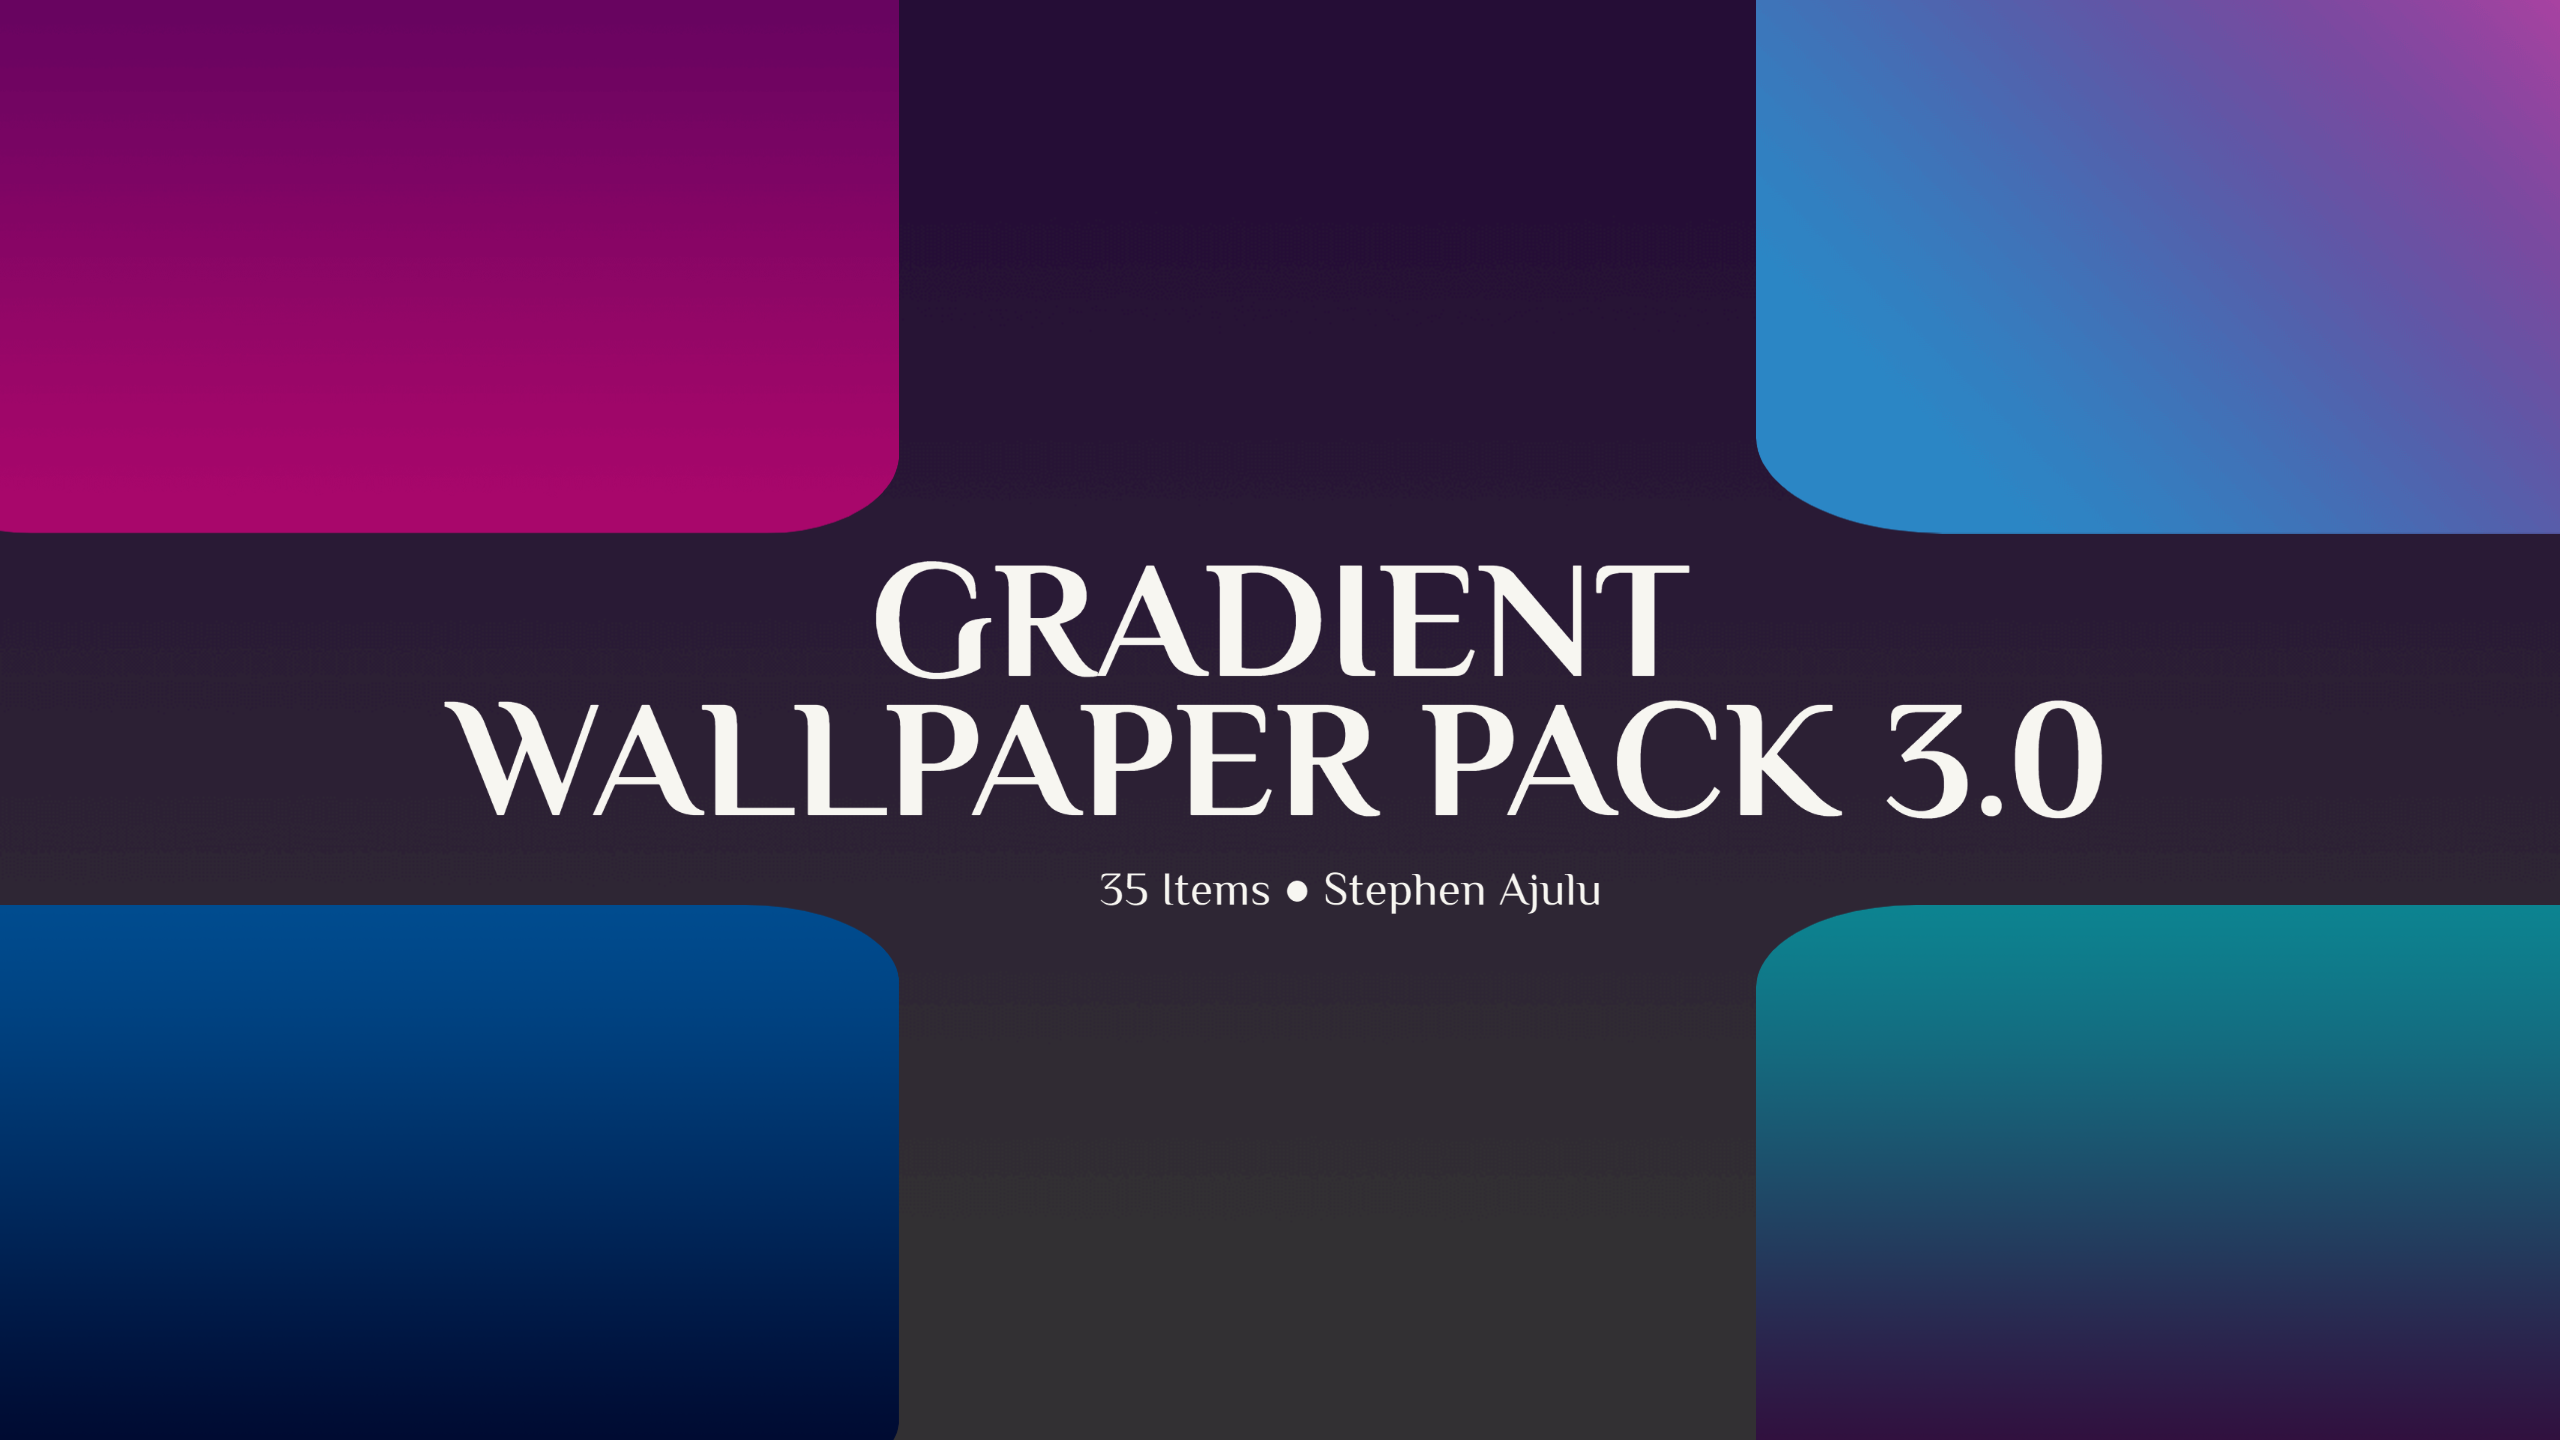 Gradient Wallpapers(8K) 3.0 feature-image